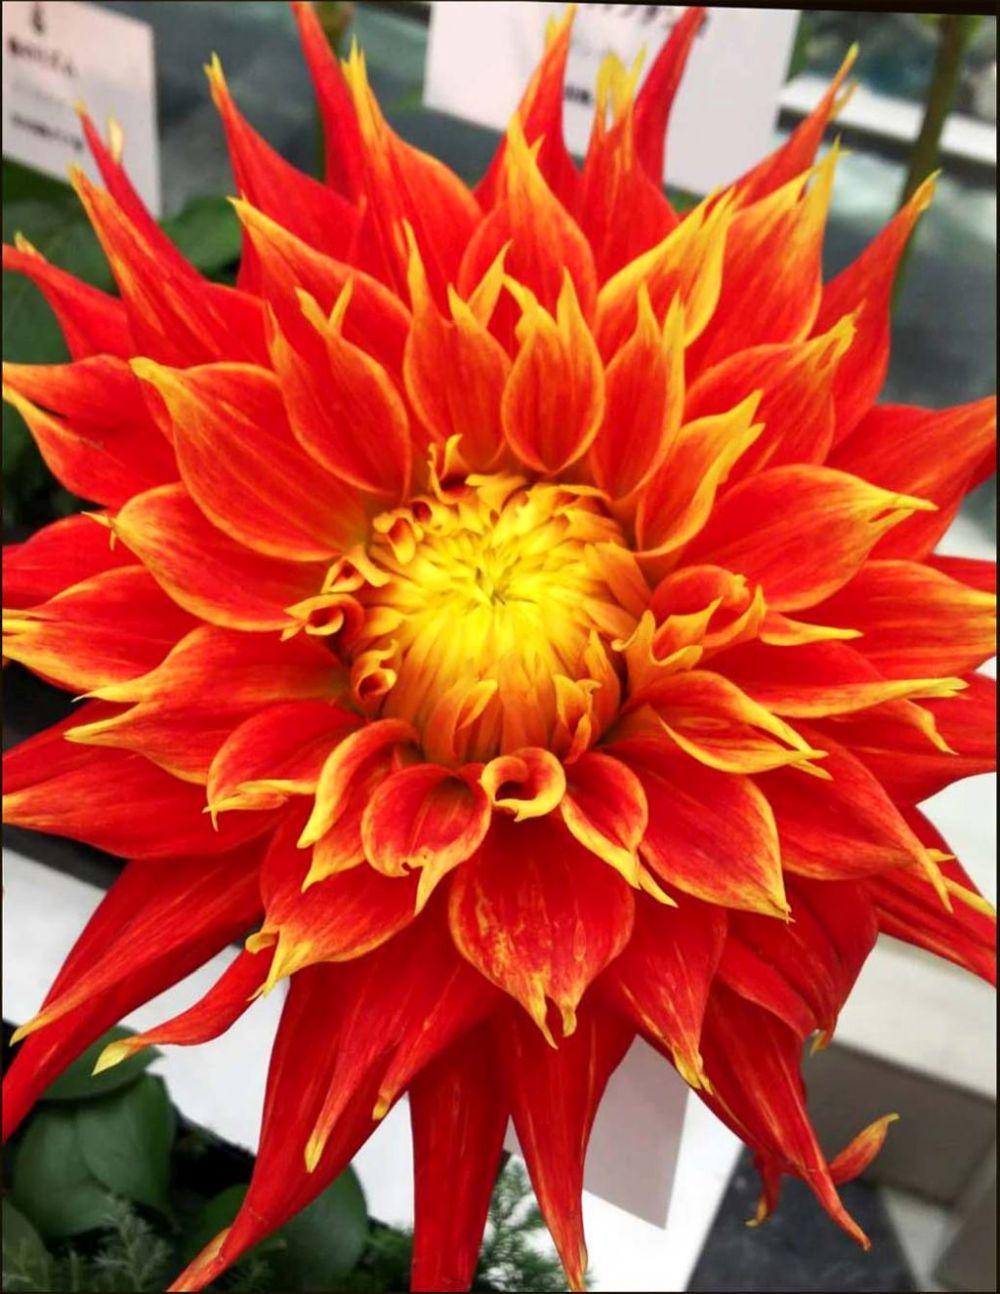 Dahlia Flowers Exhibition